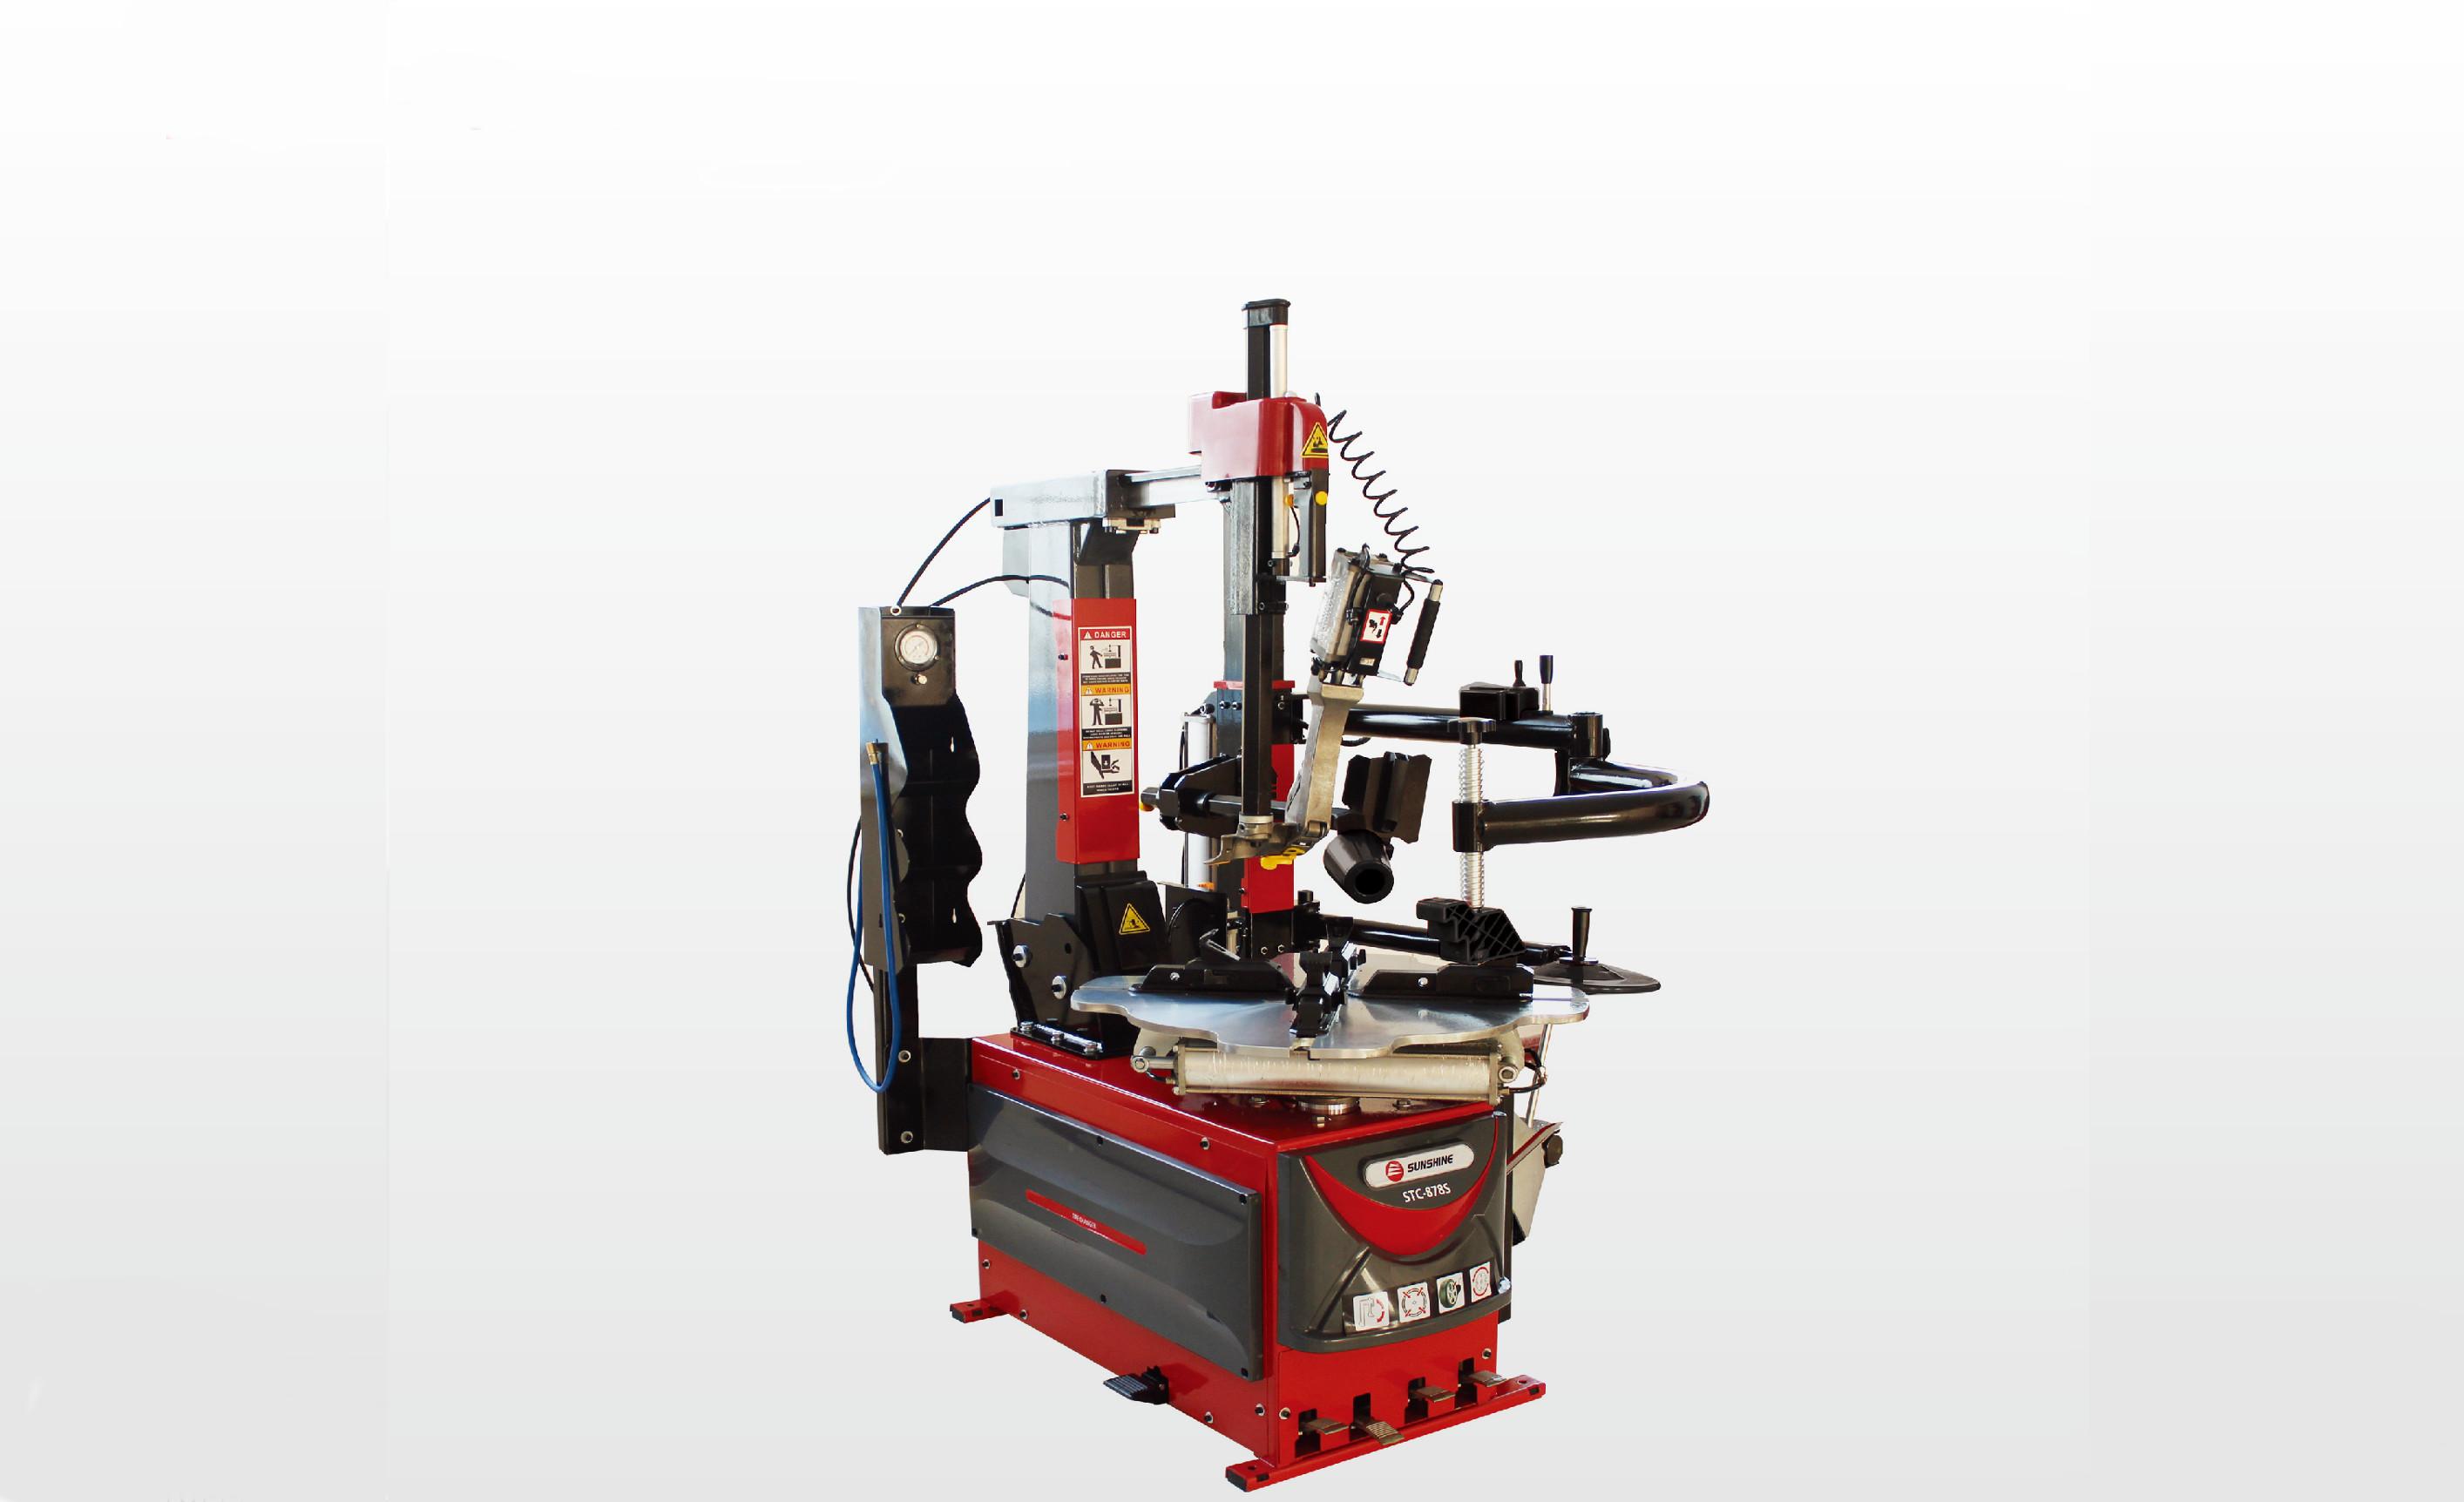 Reifenmontagemaschine STC-878S